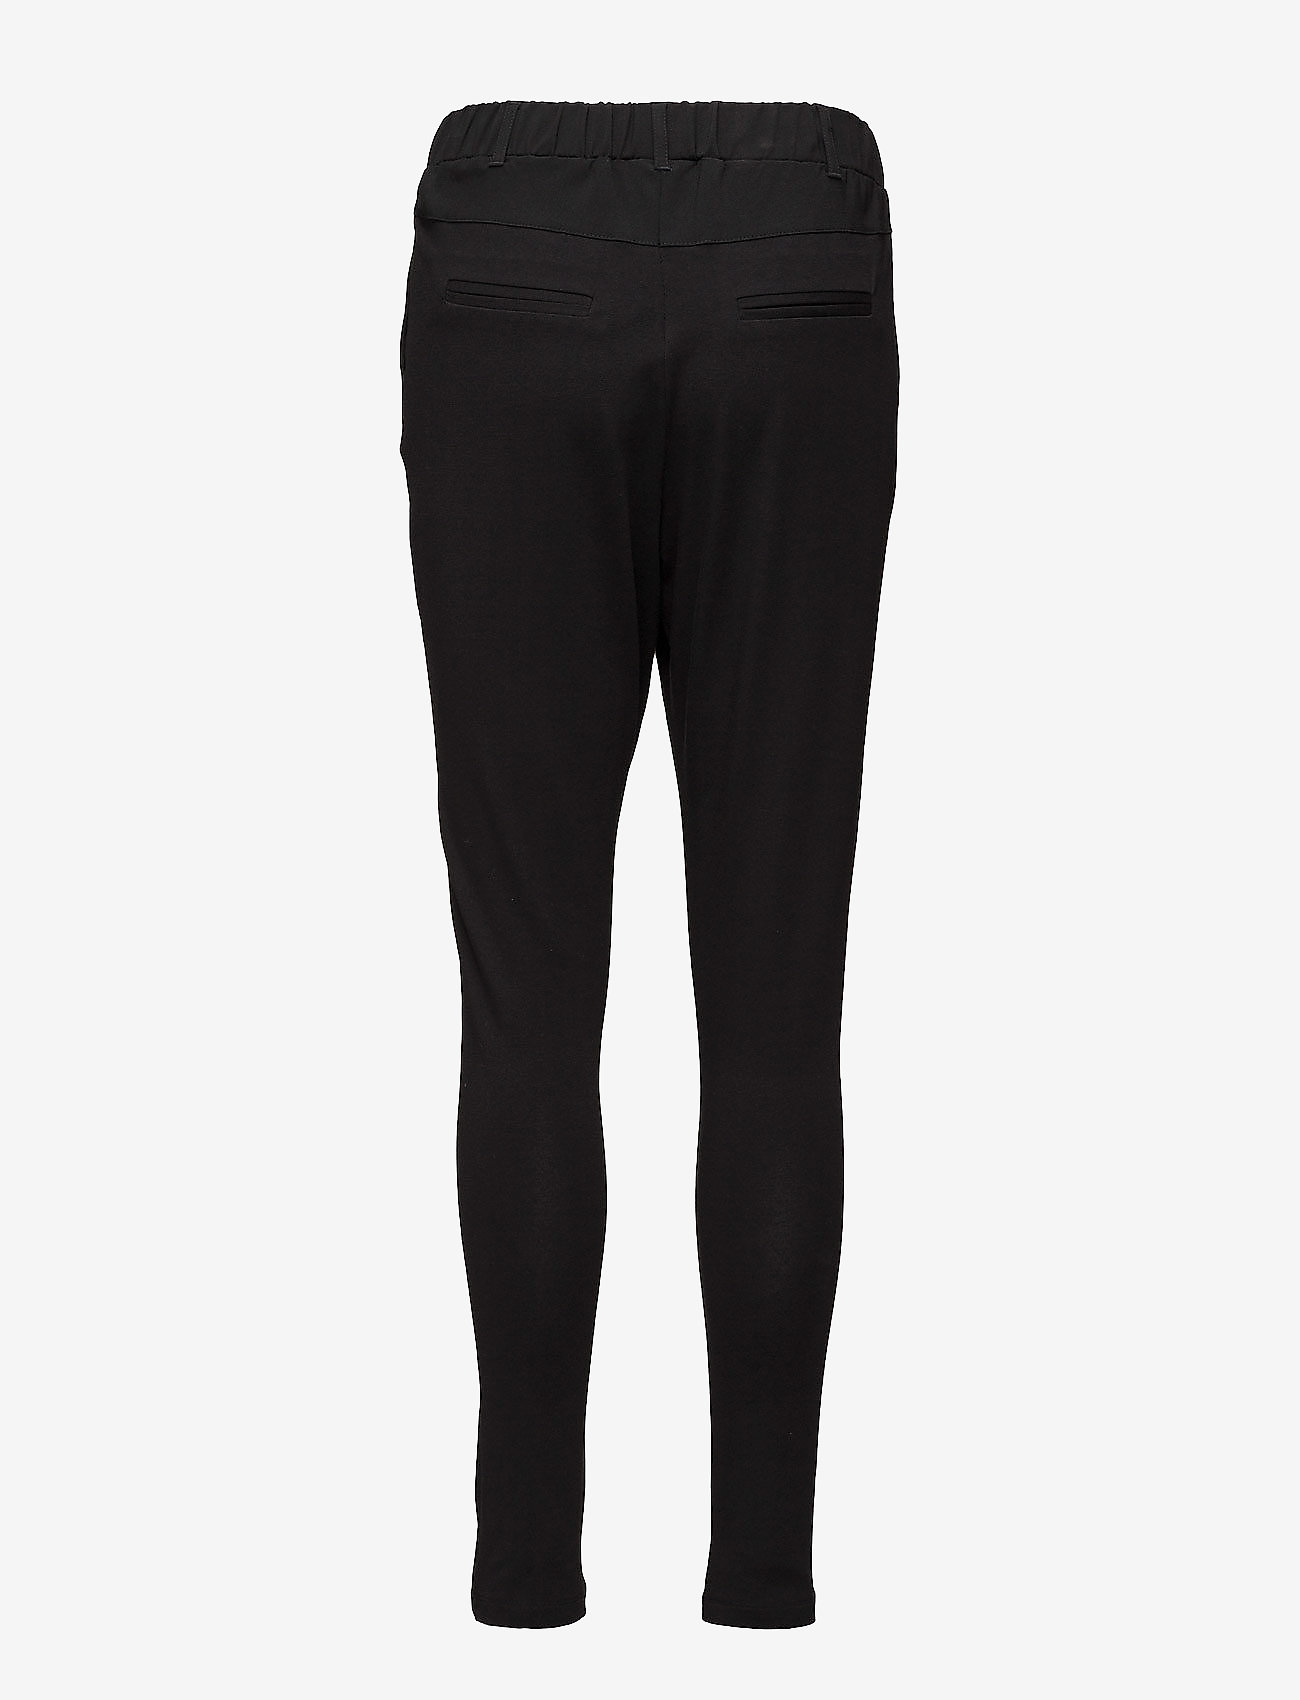 Kaffe Jillian Pants - Trousers